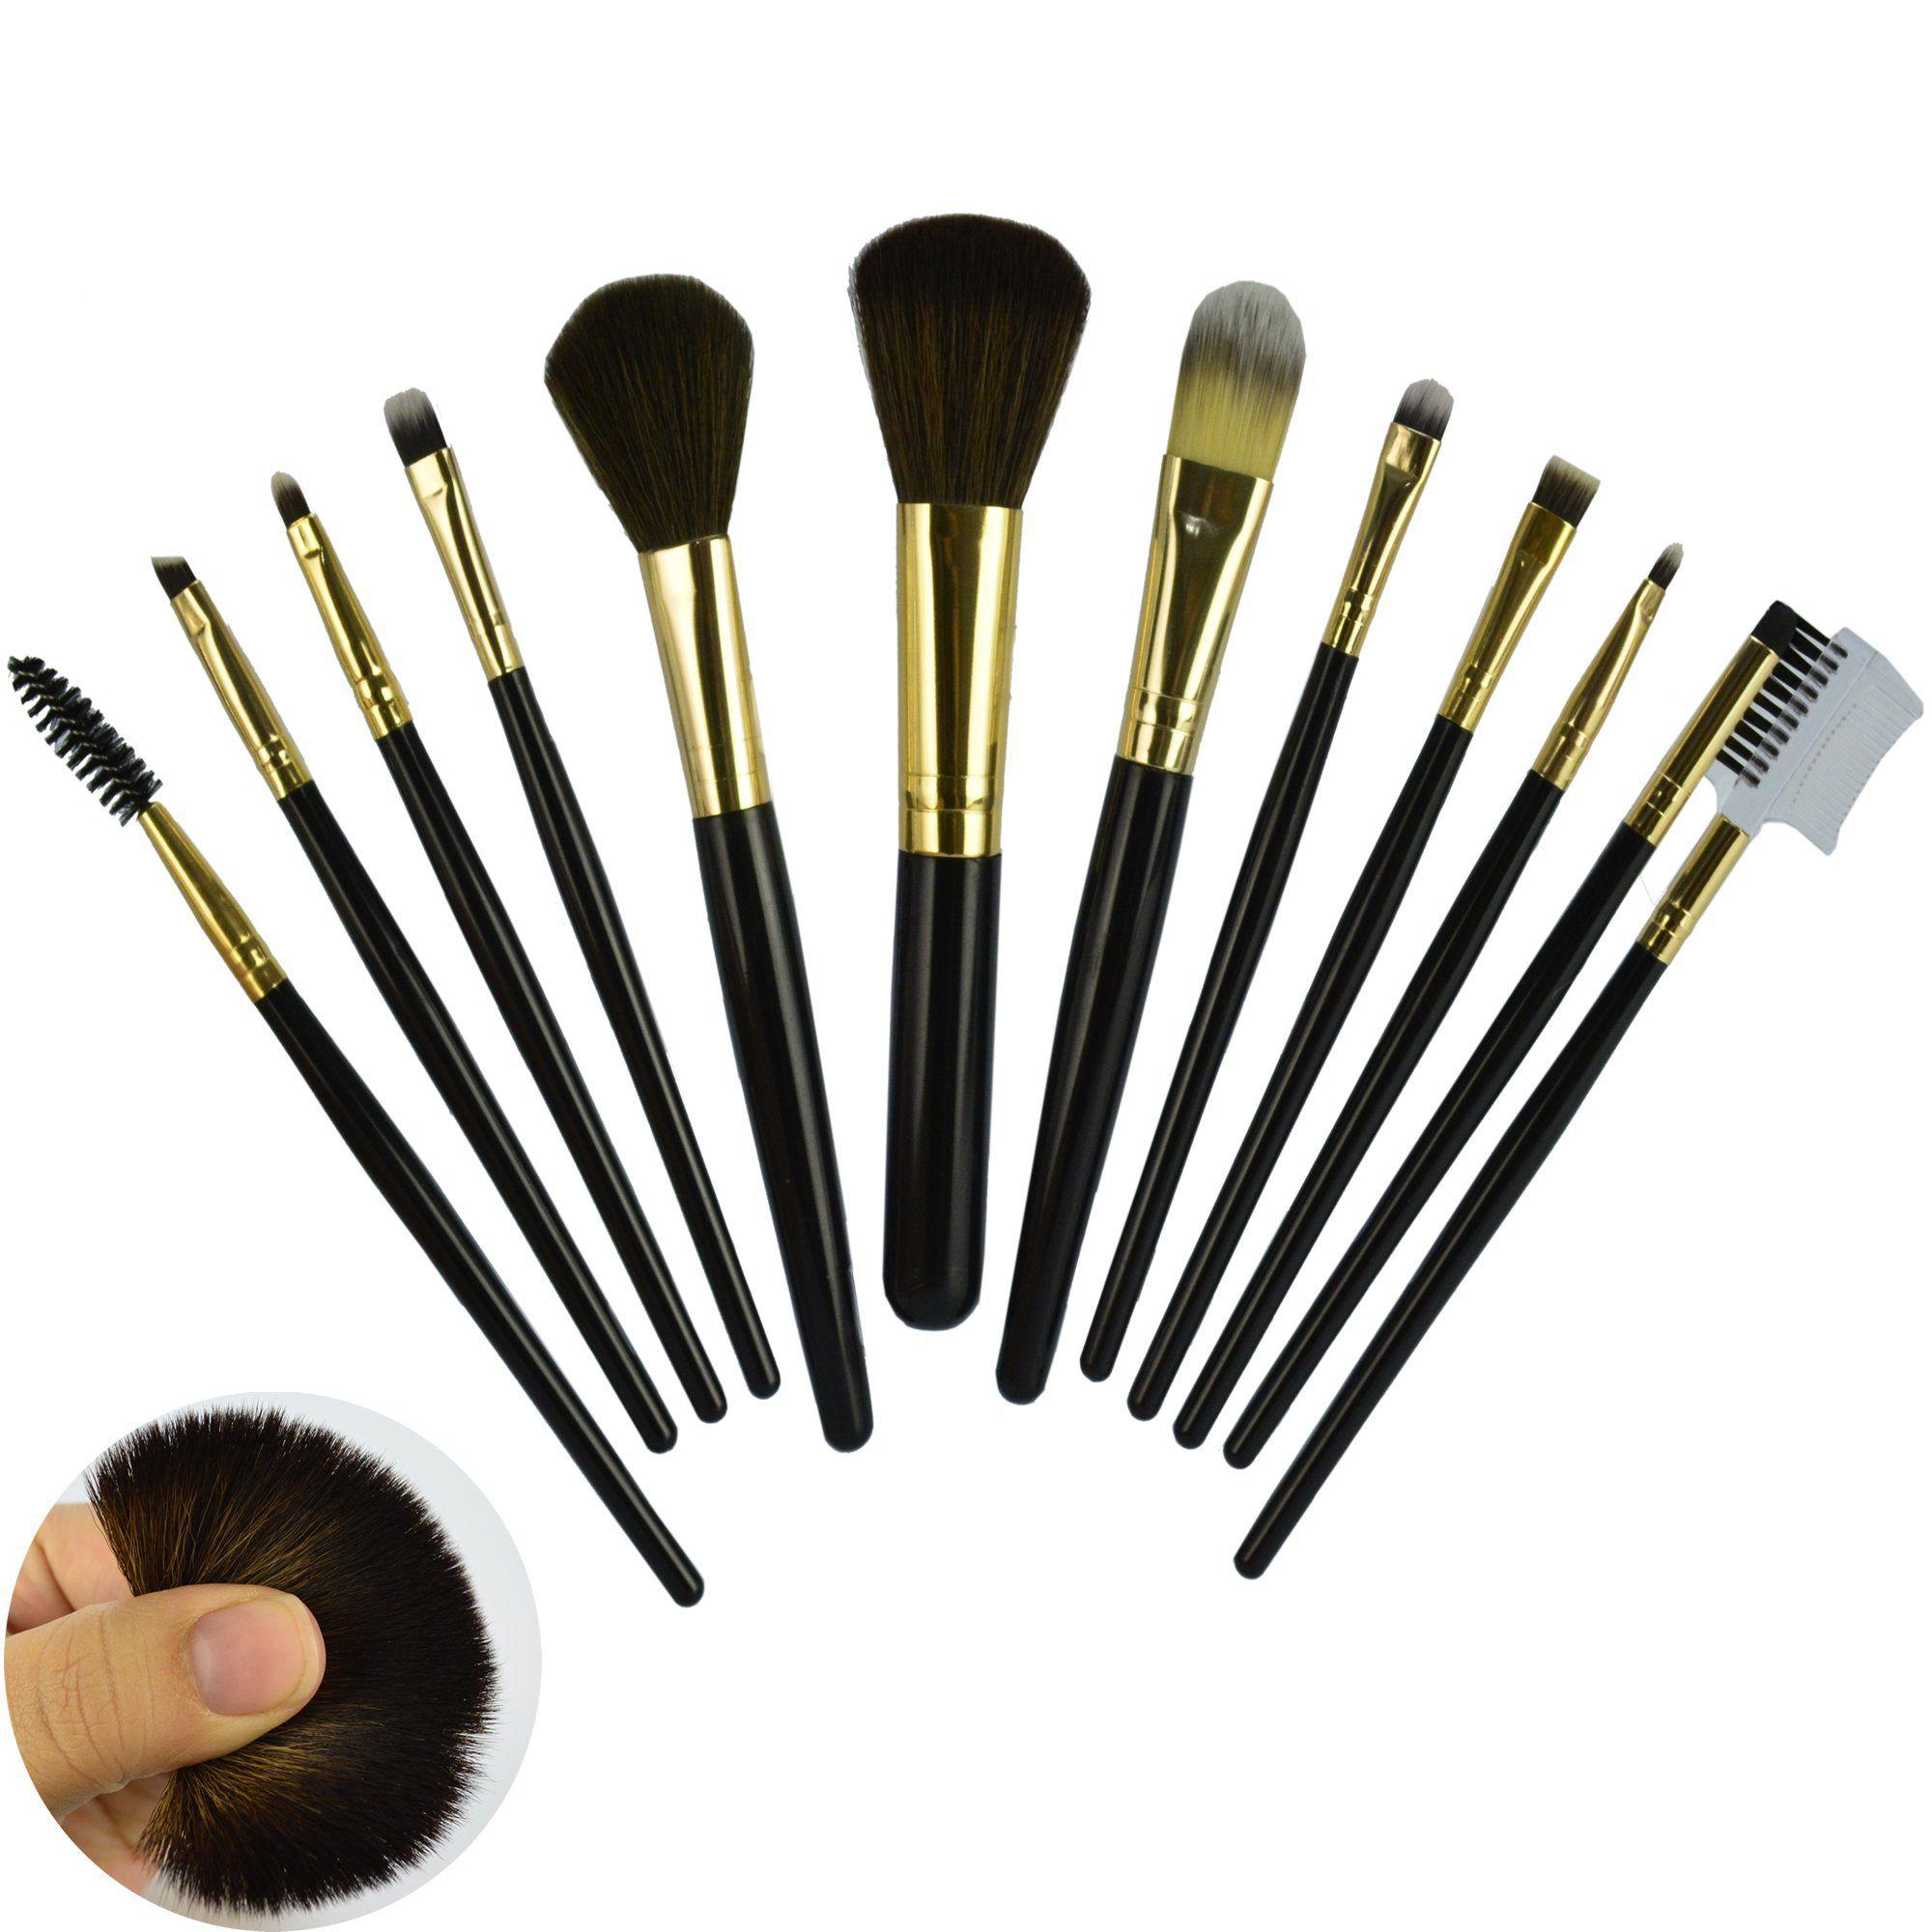 Kit 12 Pincéis Para Maquiagem Luxo Preto CBRN11018